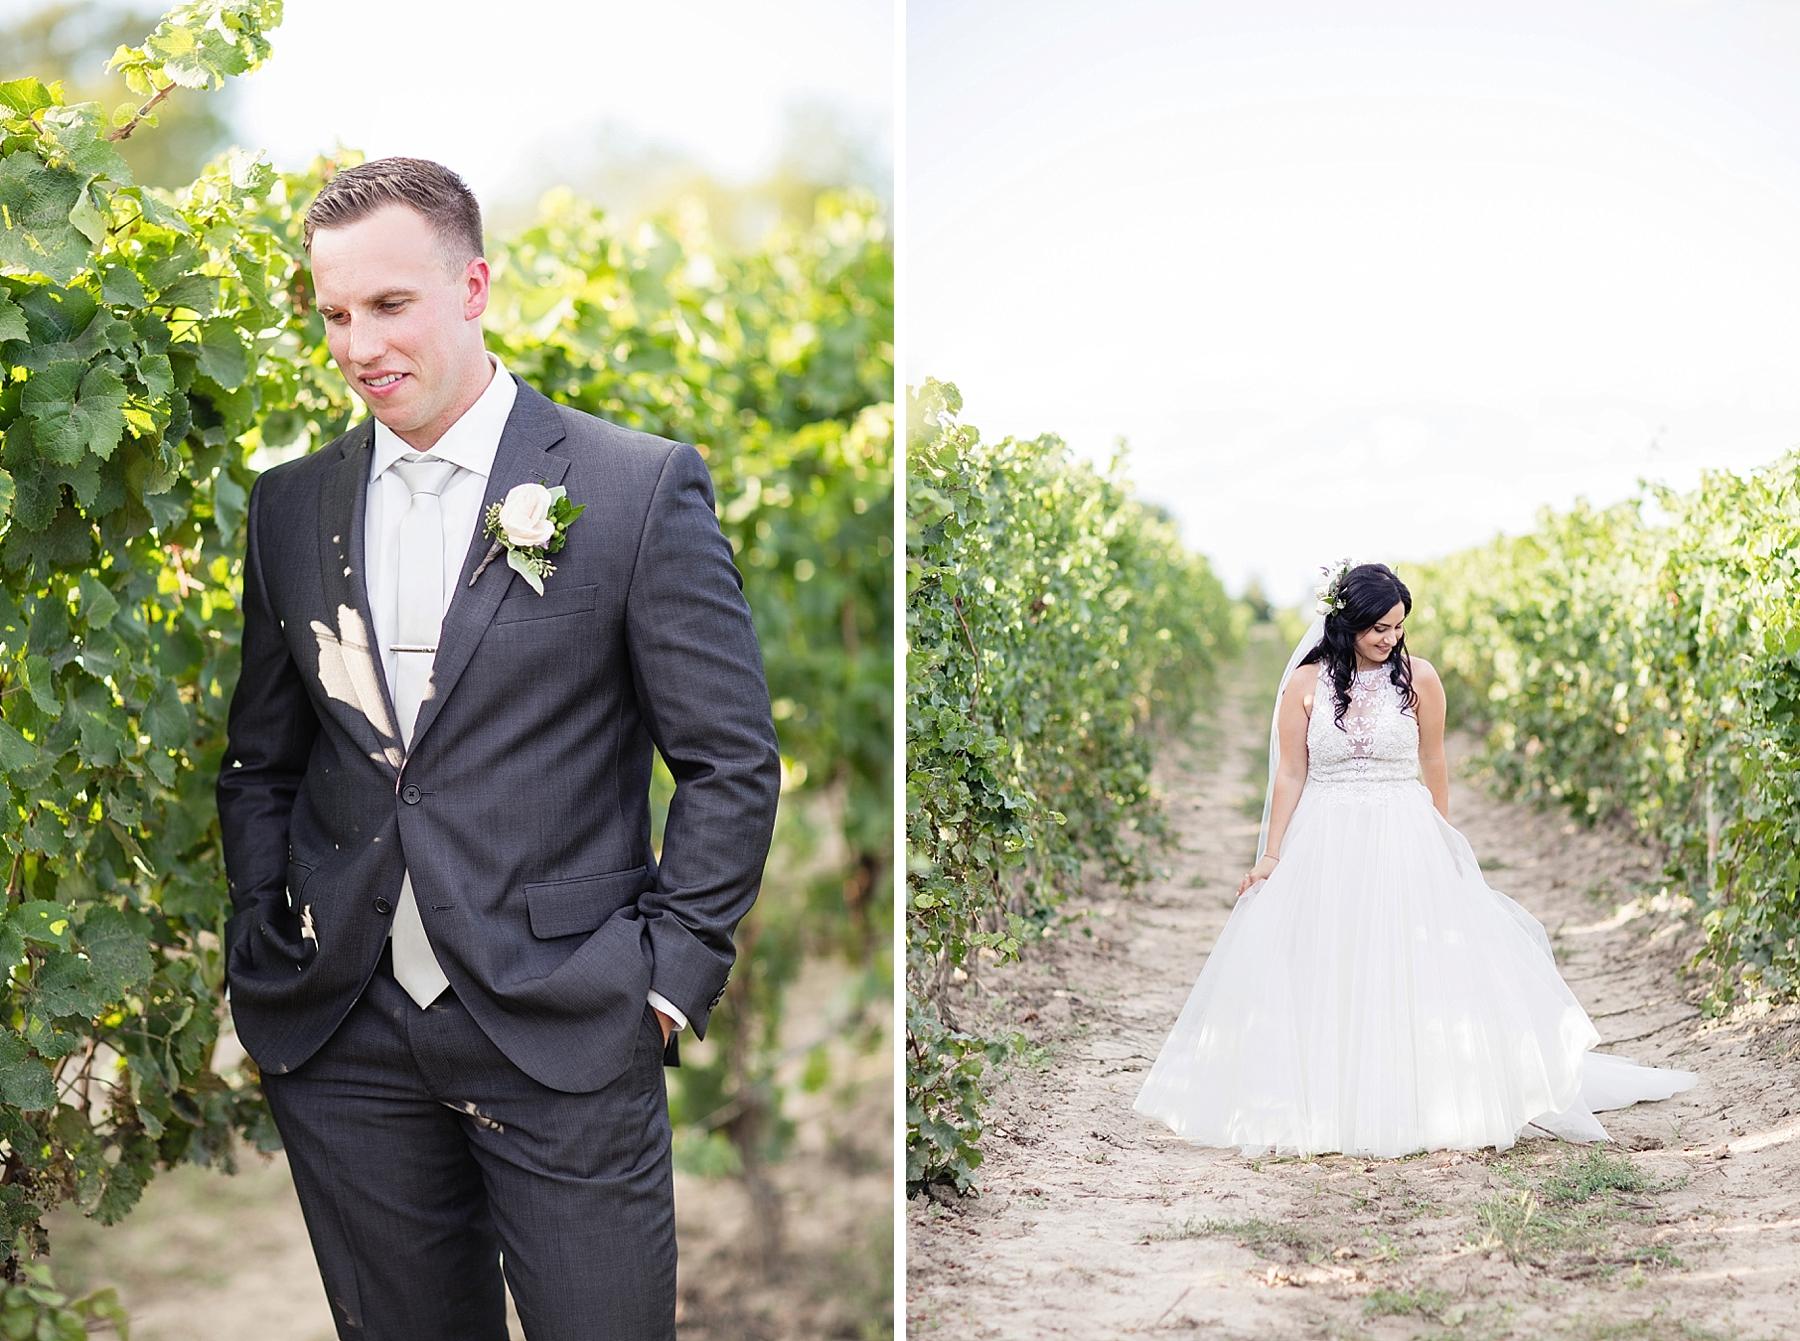 windsor-wedding-photographer-sprucewood-shores-winery-wedding-niagara-on-the-lake-wedding-photographer-eryn-shea-photography_0043.jpg